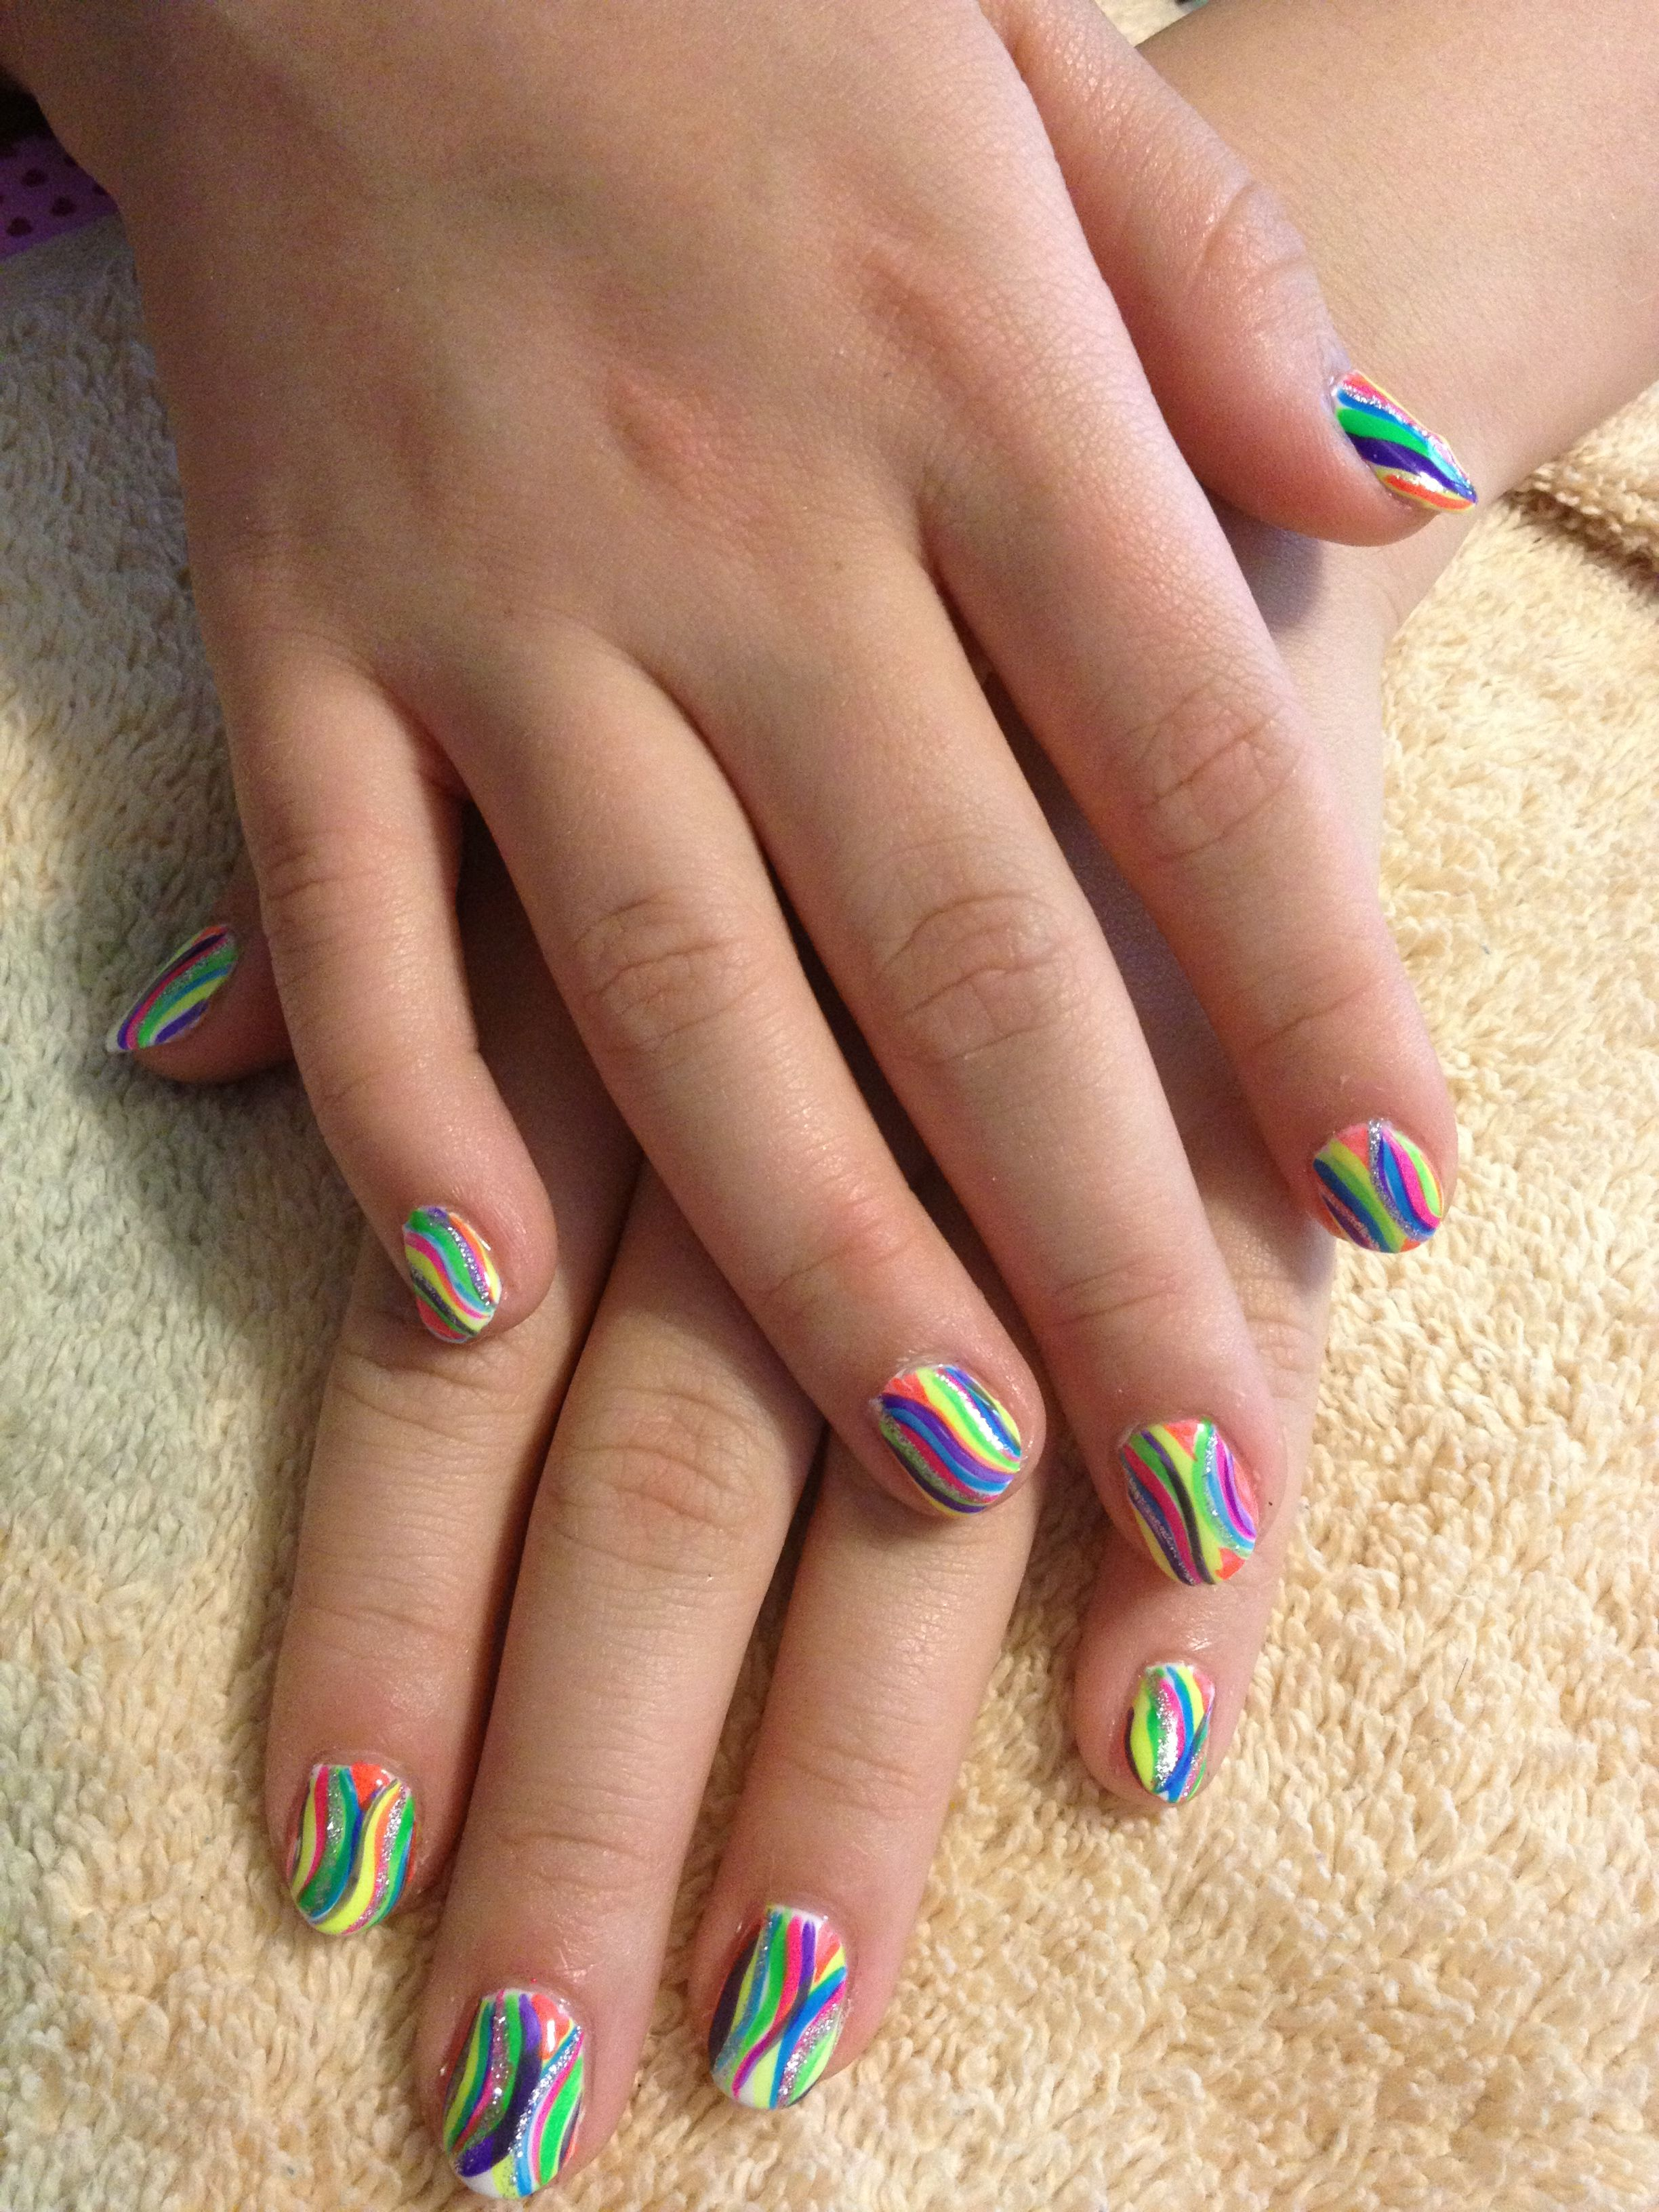 Gel mani with neon rainbow nails | Sara\'s nail designs | Pinterest